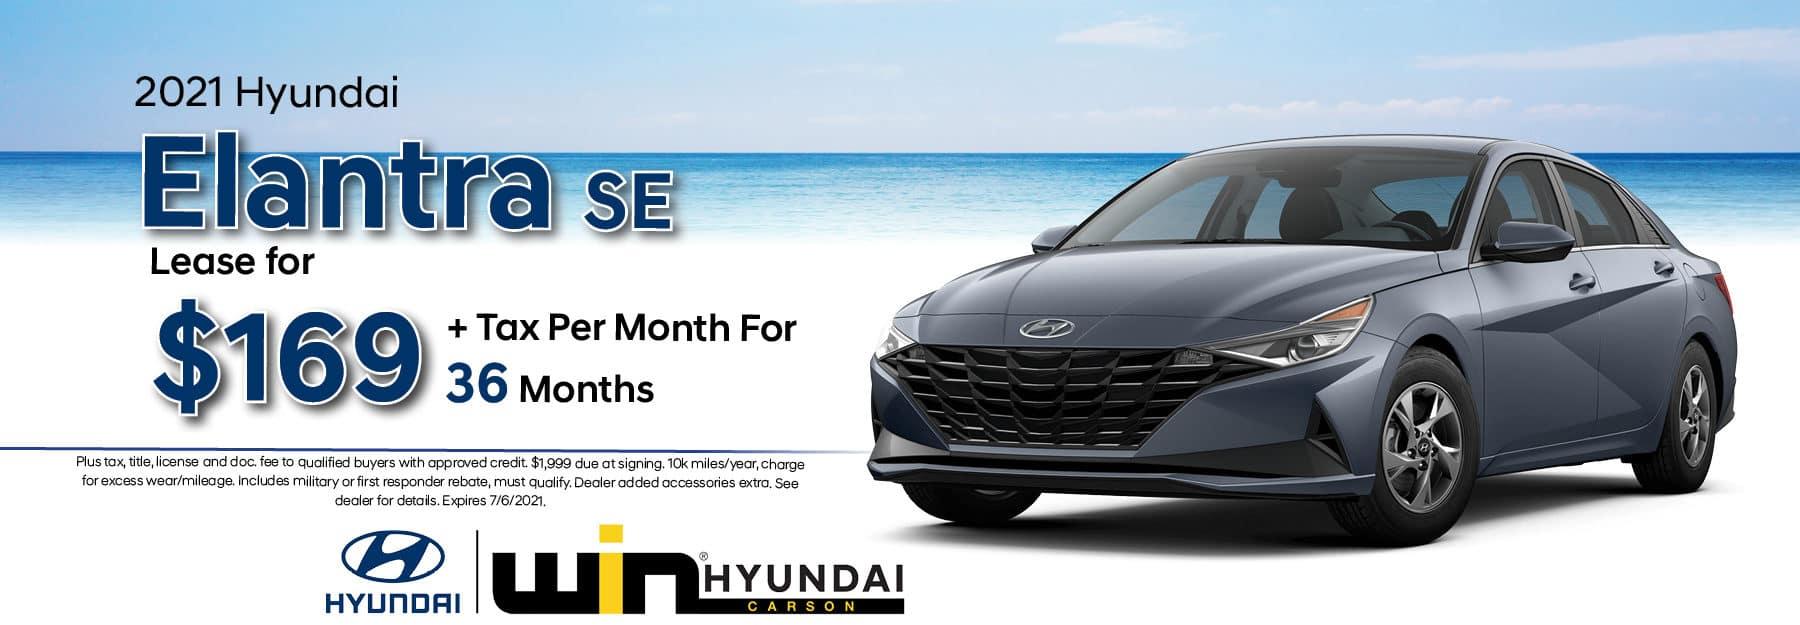 061.240.02_WIN_Hyundai_Carson_1800x625_Elantra_Dealer Web